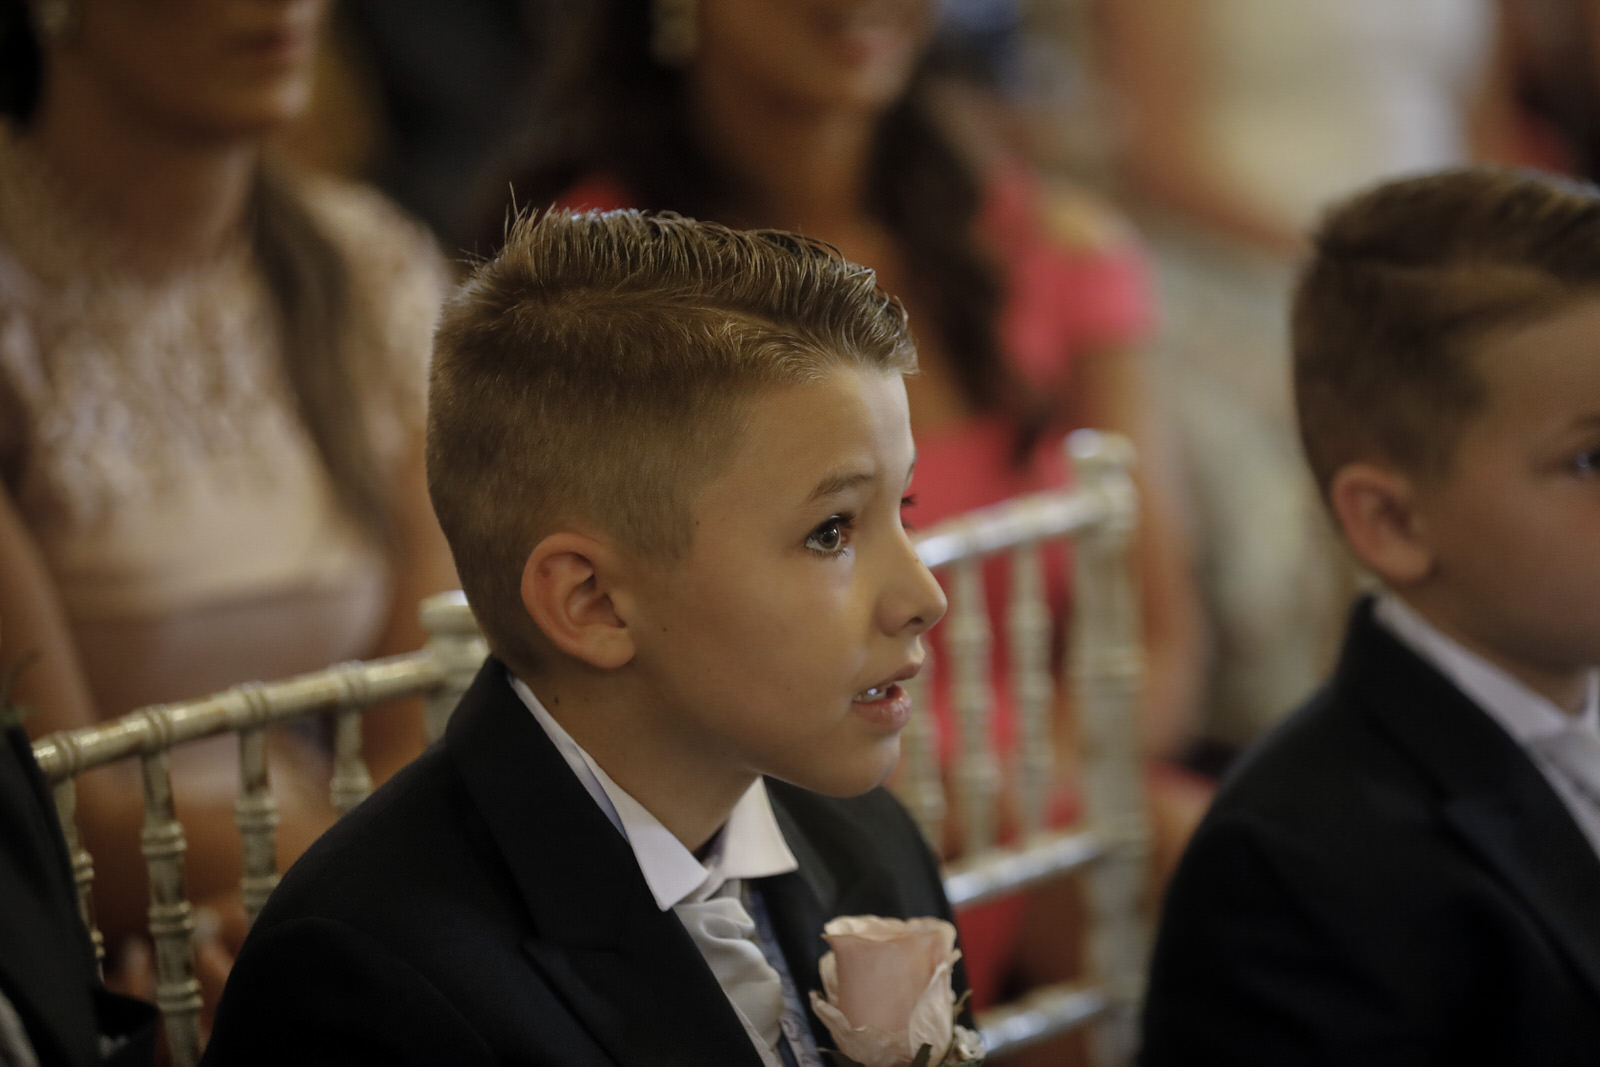 darver_castle_wedding_photographer_goldenmonentsweddingphotography_a228.jpg